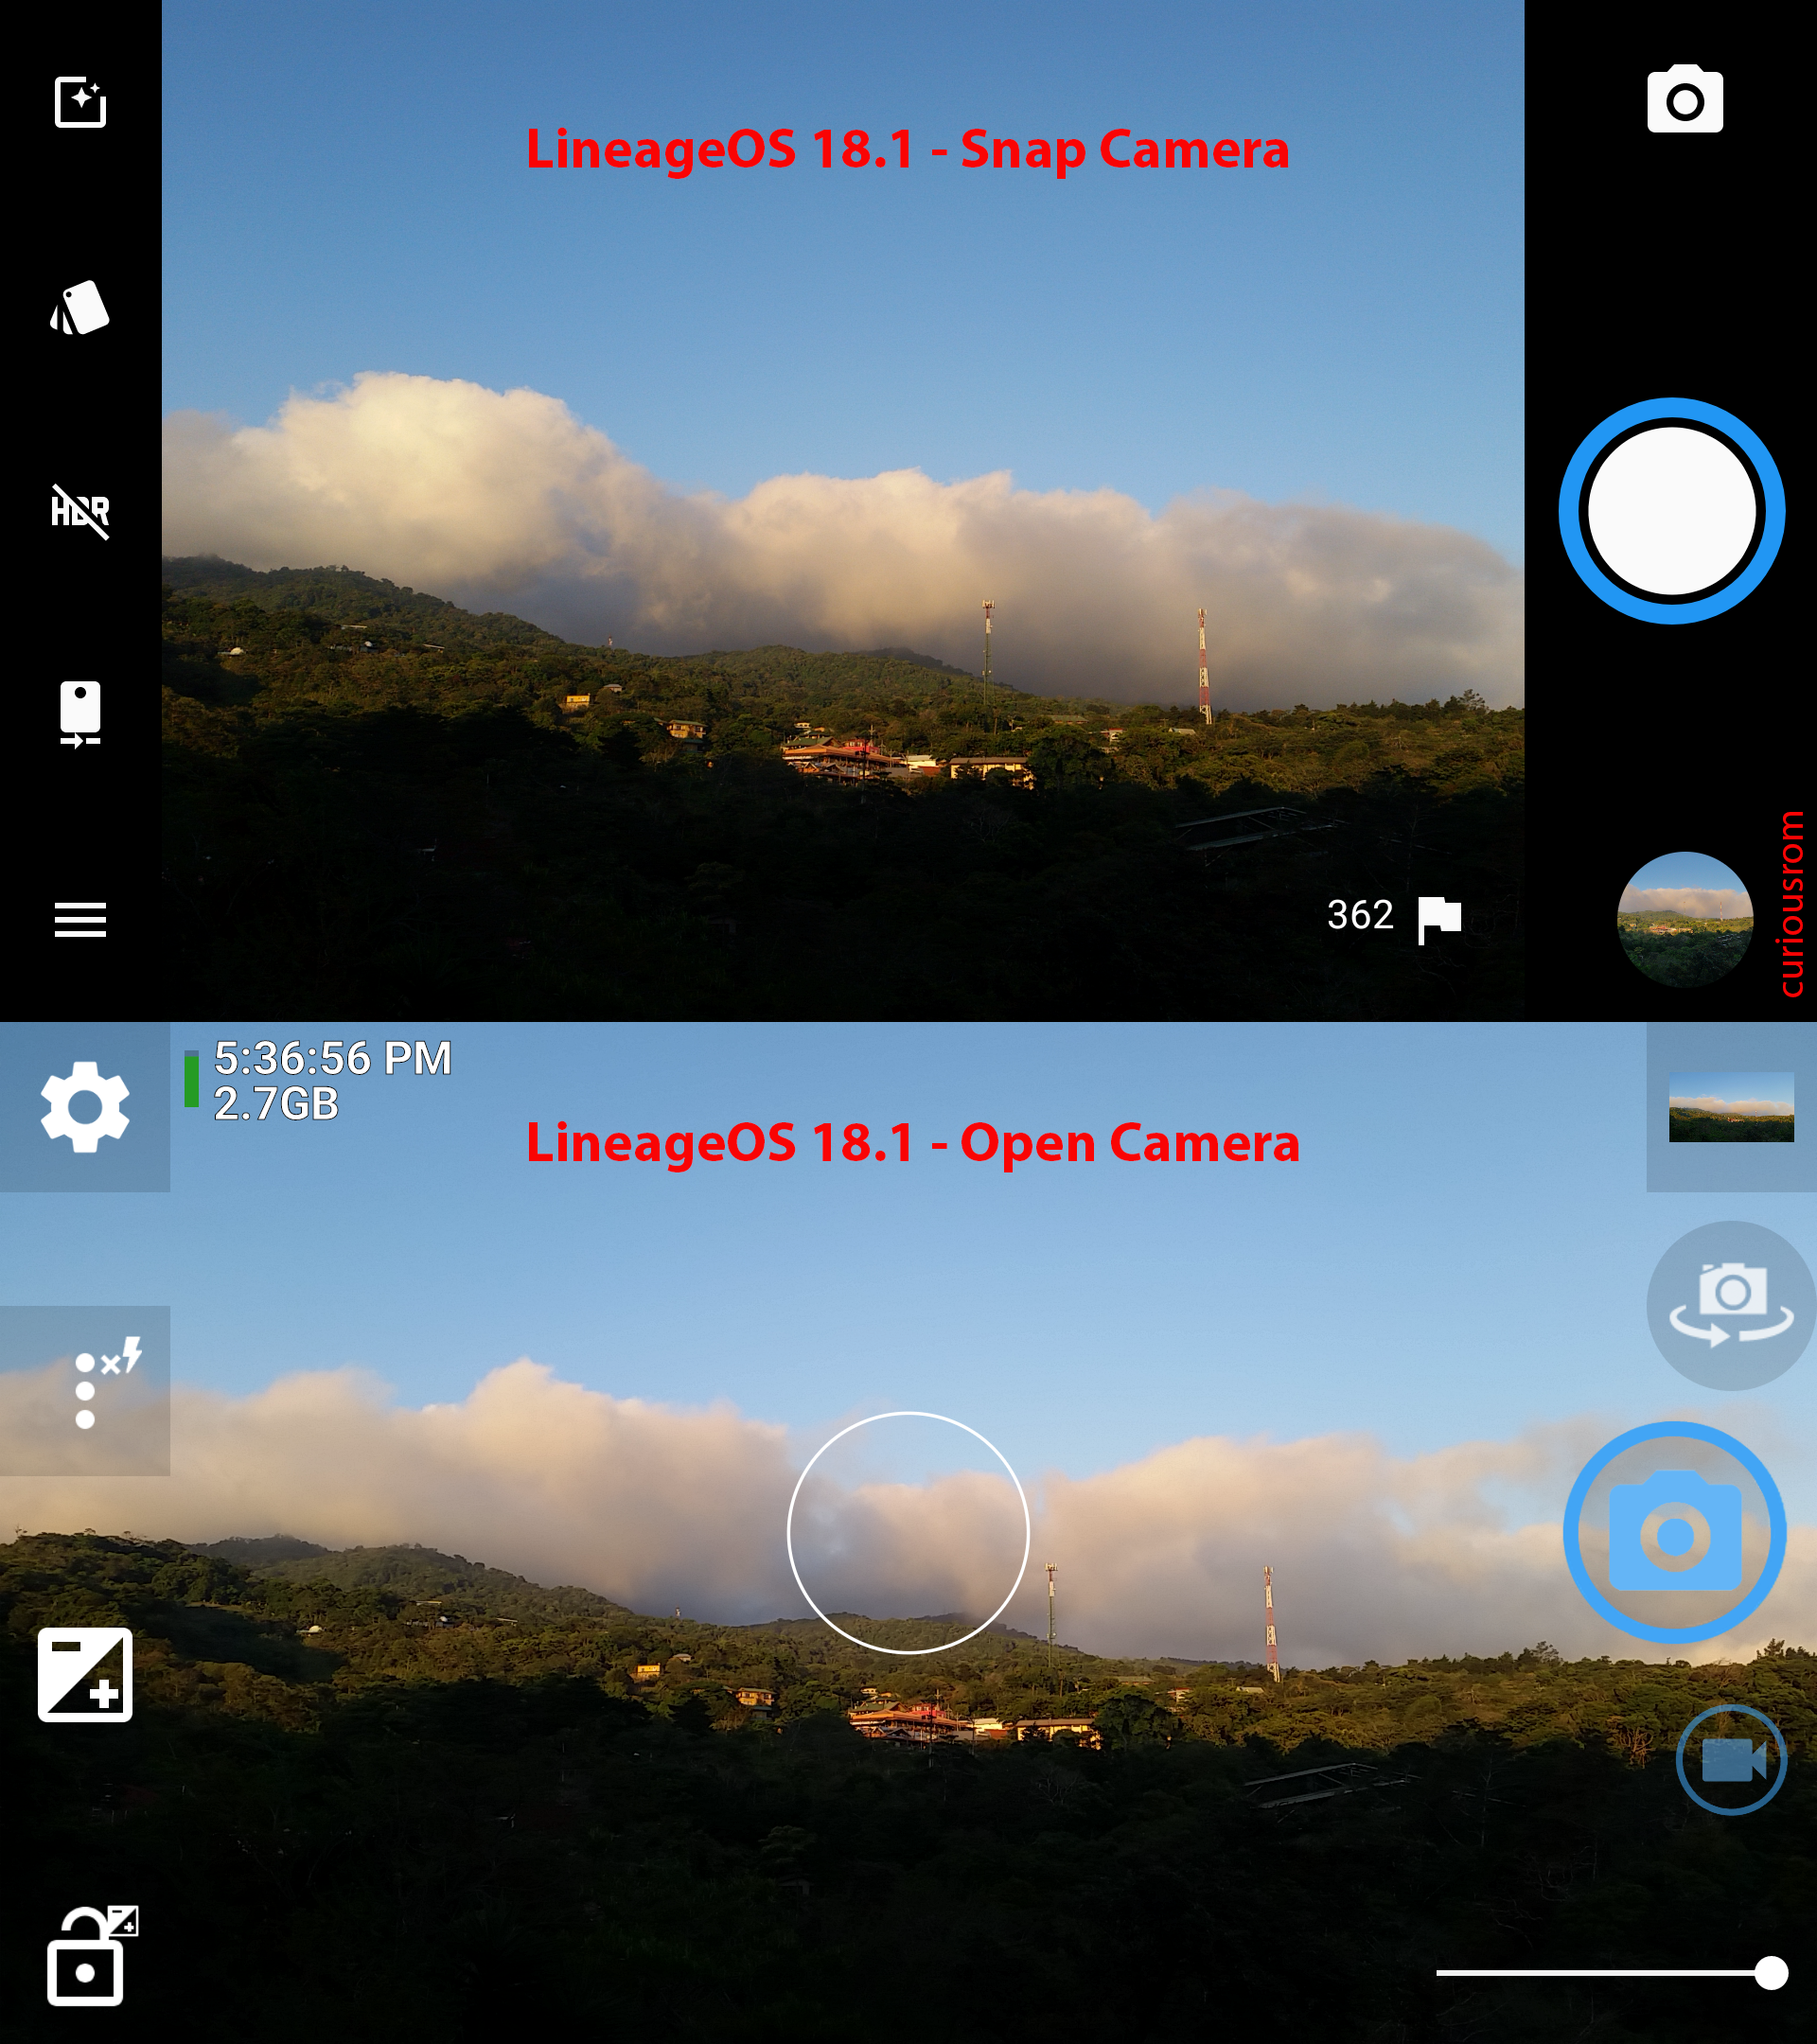 Camera_Snap_vs_Open_Camera_LineageOS_18-1_S5_curiousrom.png